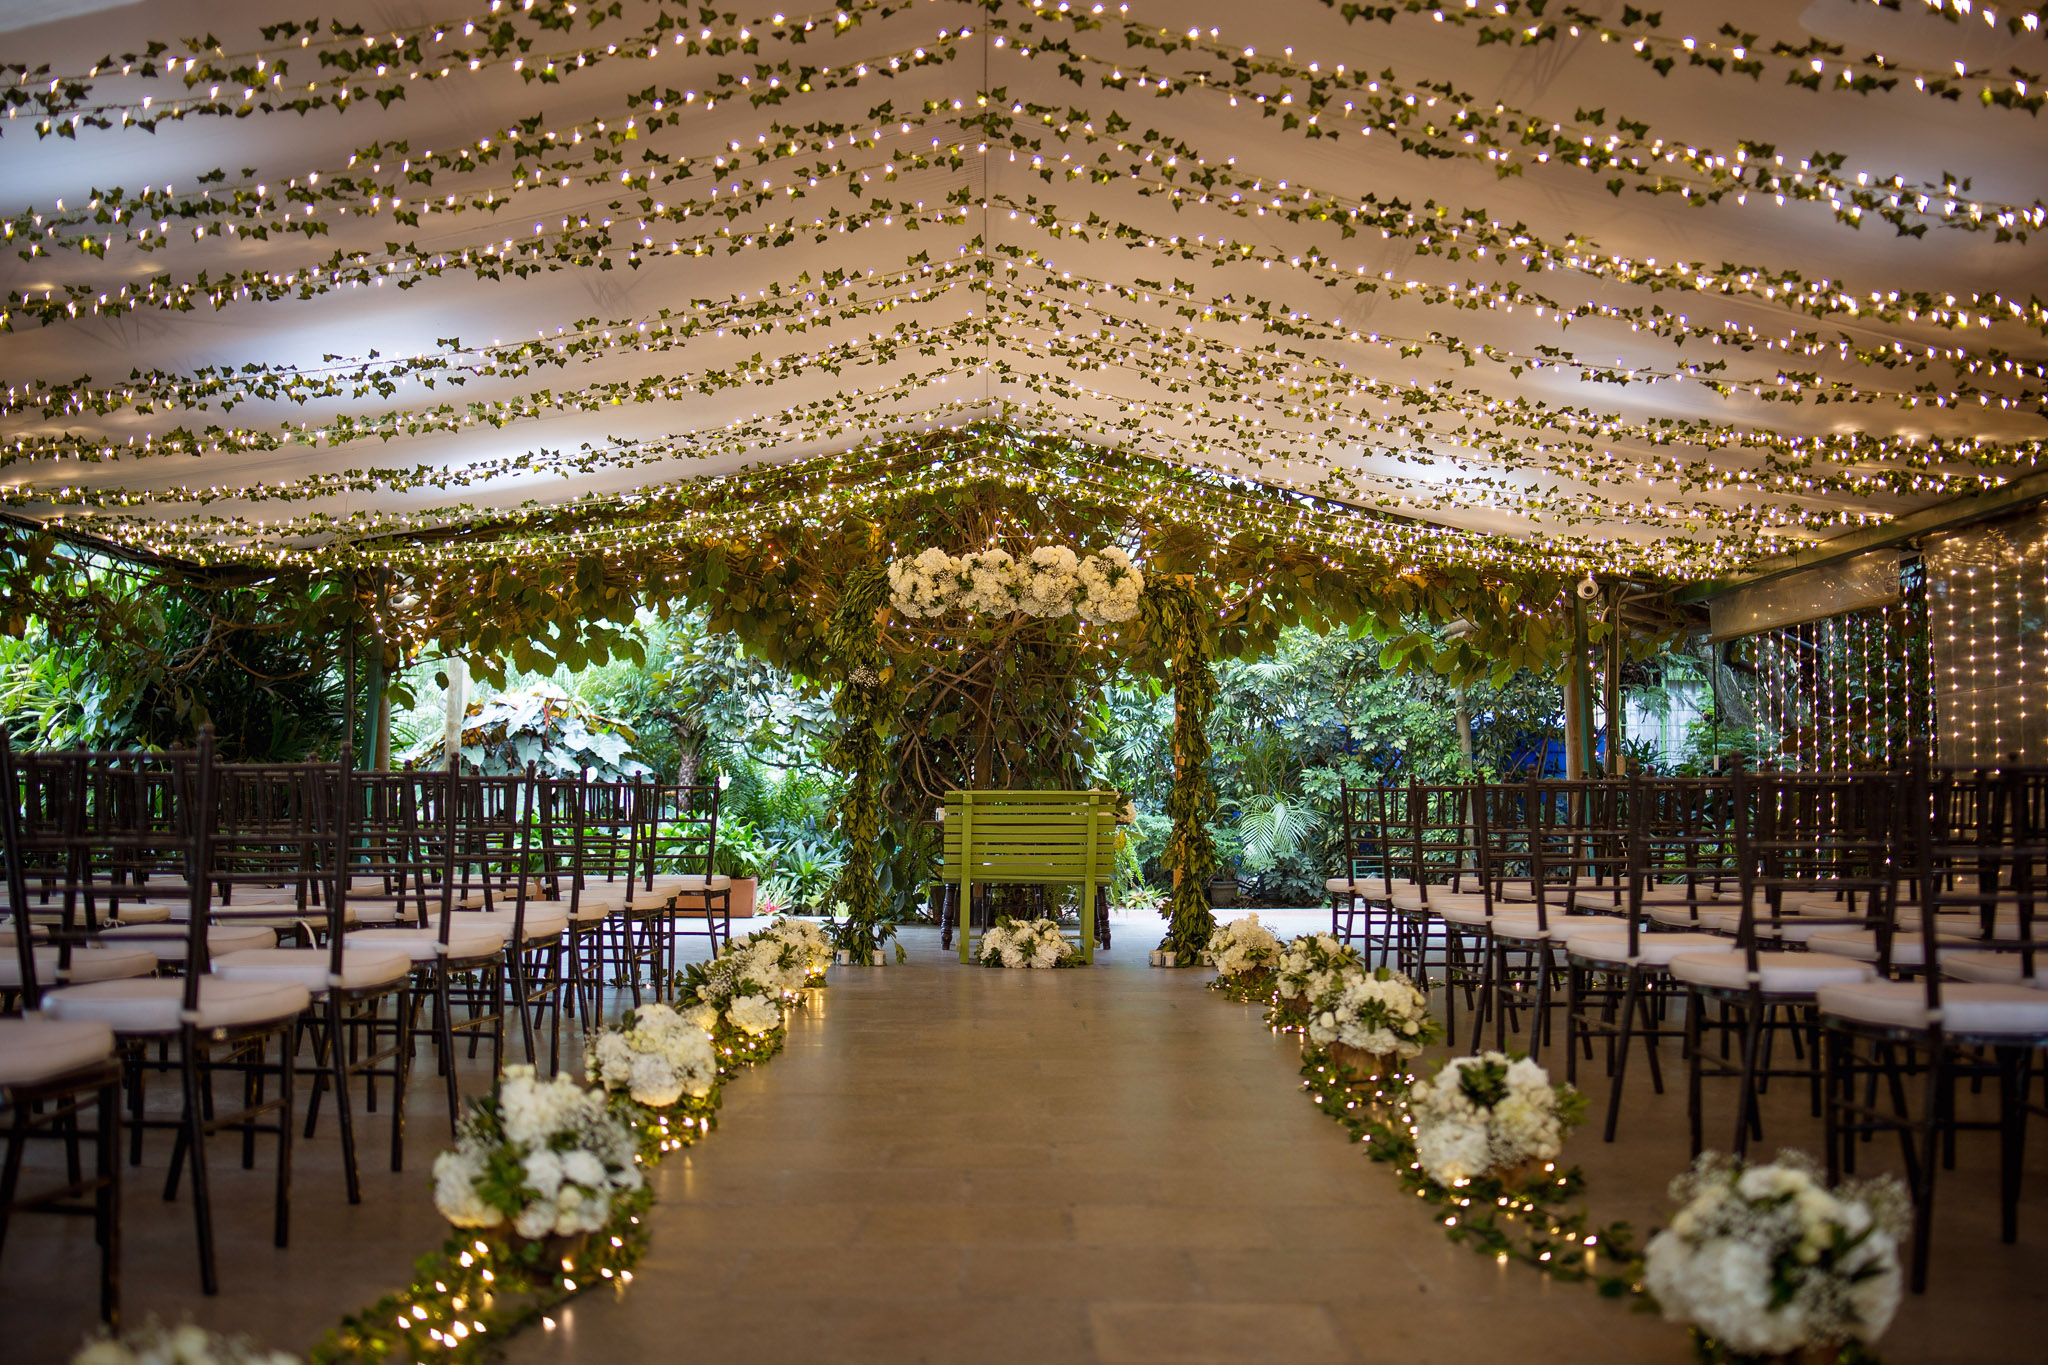 wedding-travellers-destination-wedding-photography-colombia-medellin-chuscalito-light-decoration-romantic